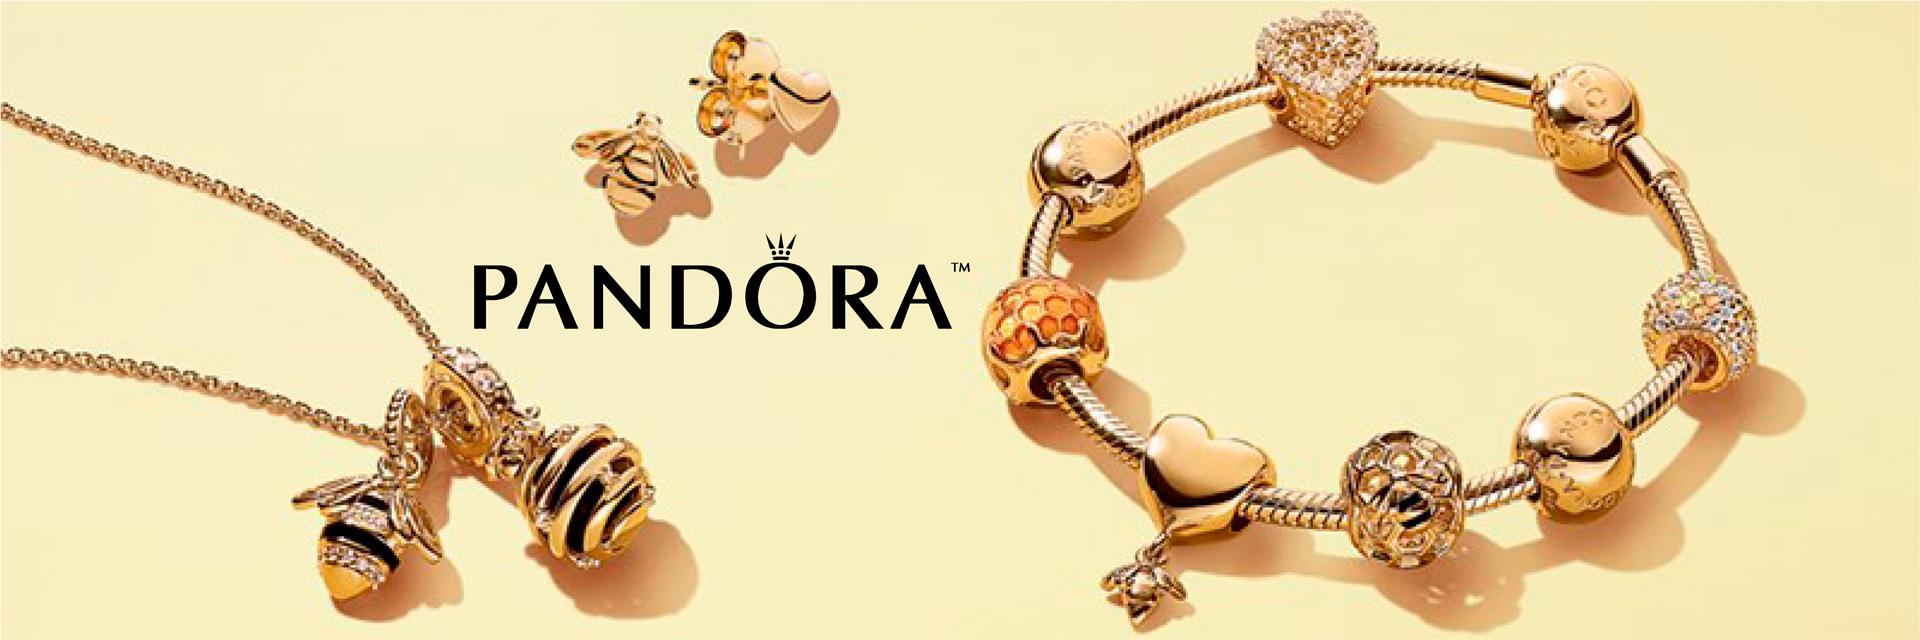 Pandora Silver/Gold Kollektion